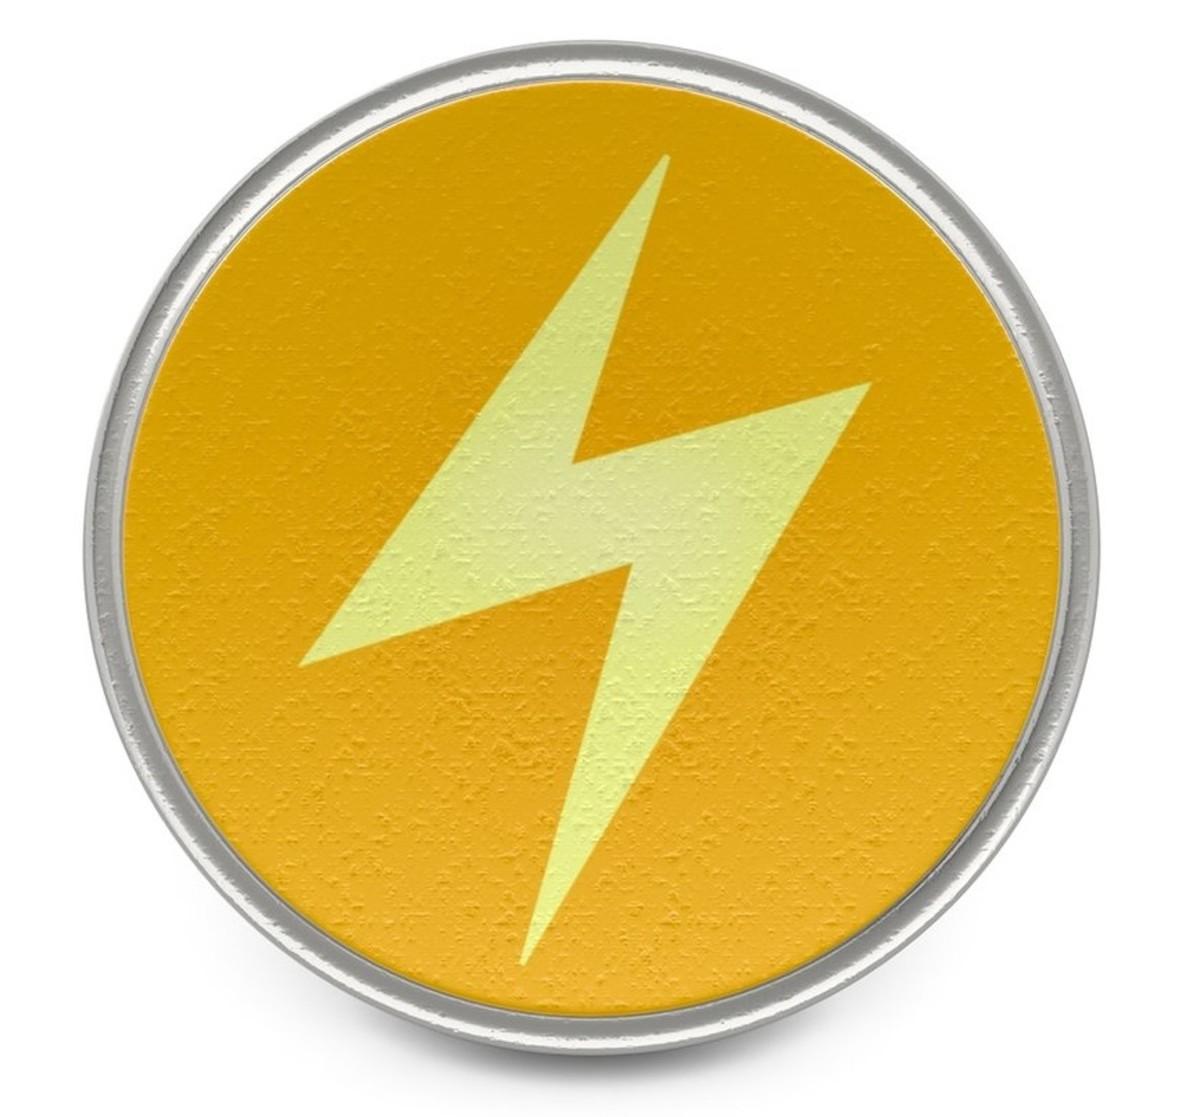 Electric Pokémon logo